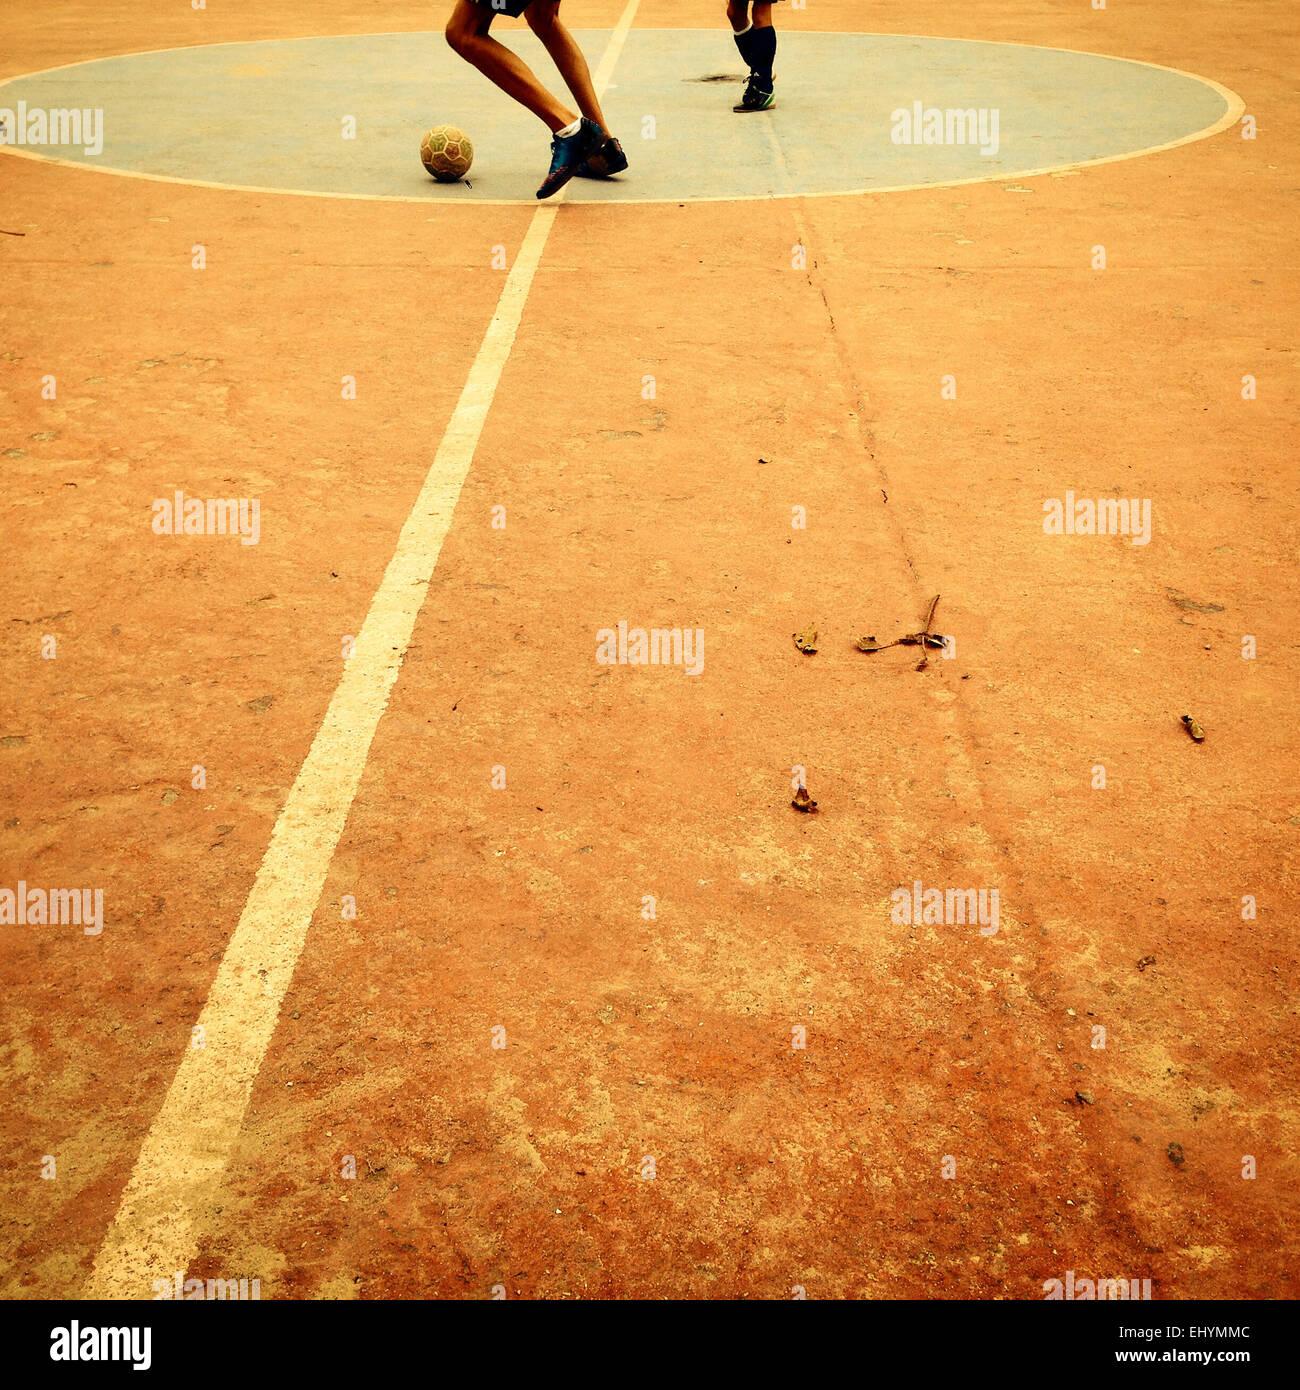 Les garçons jouent au football Photo Stock